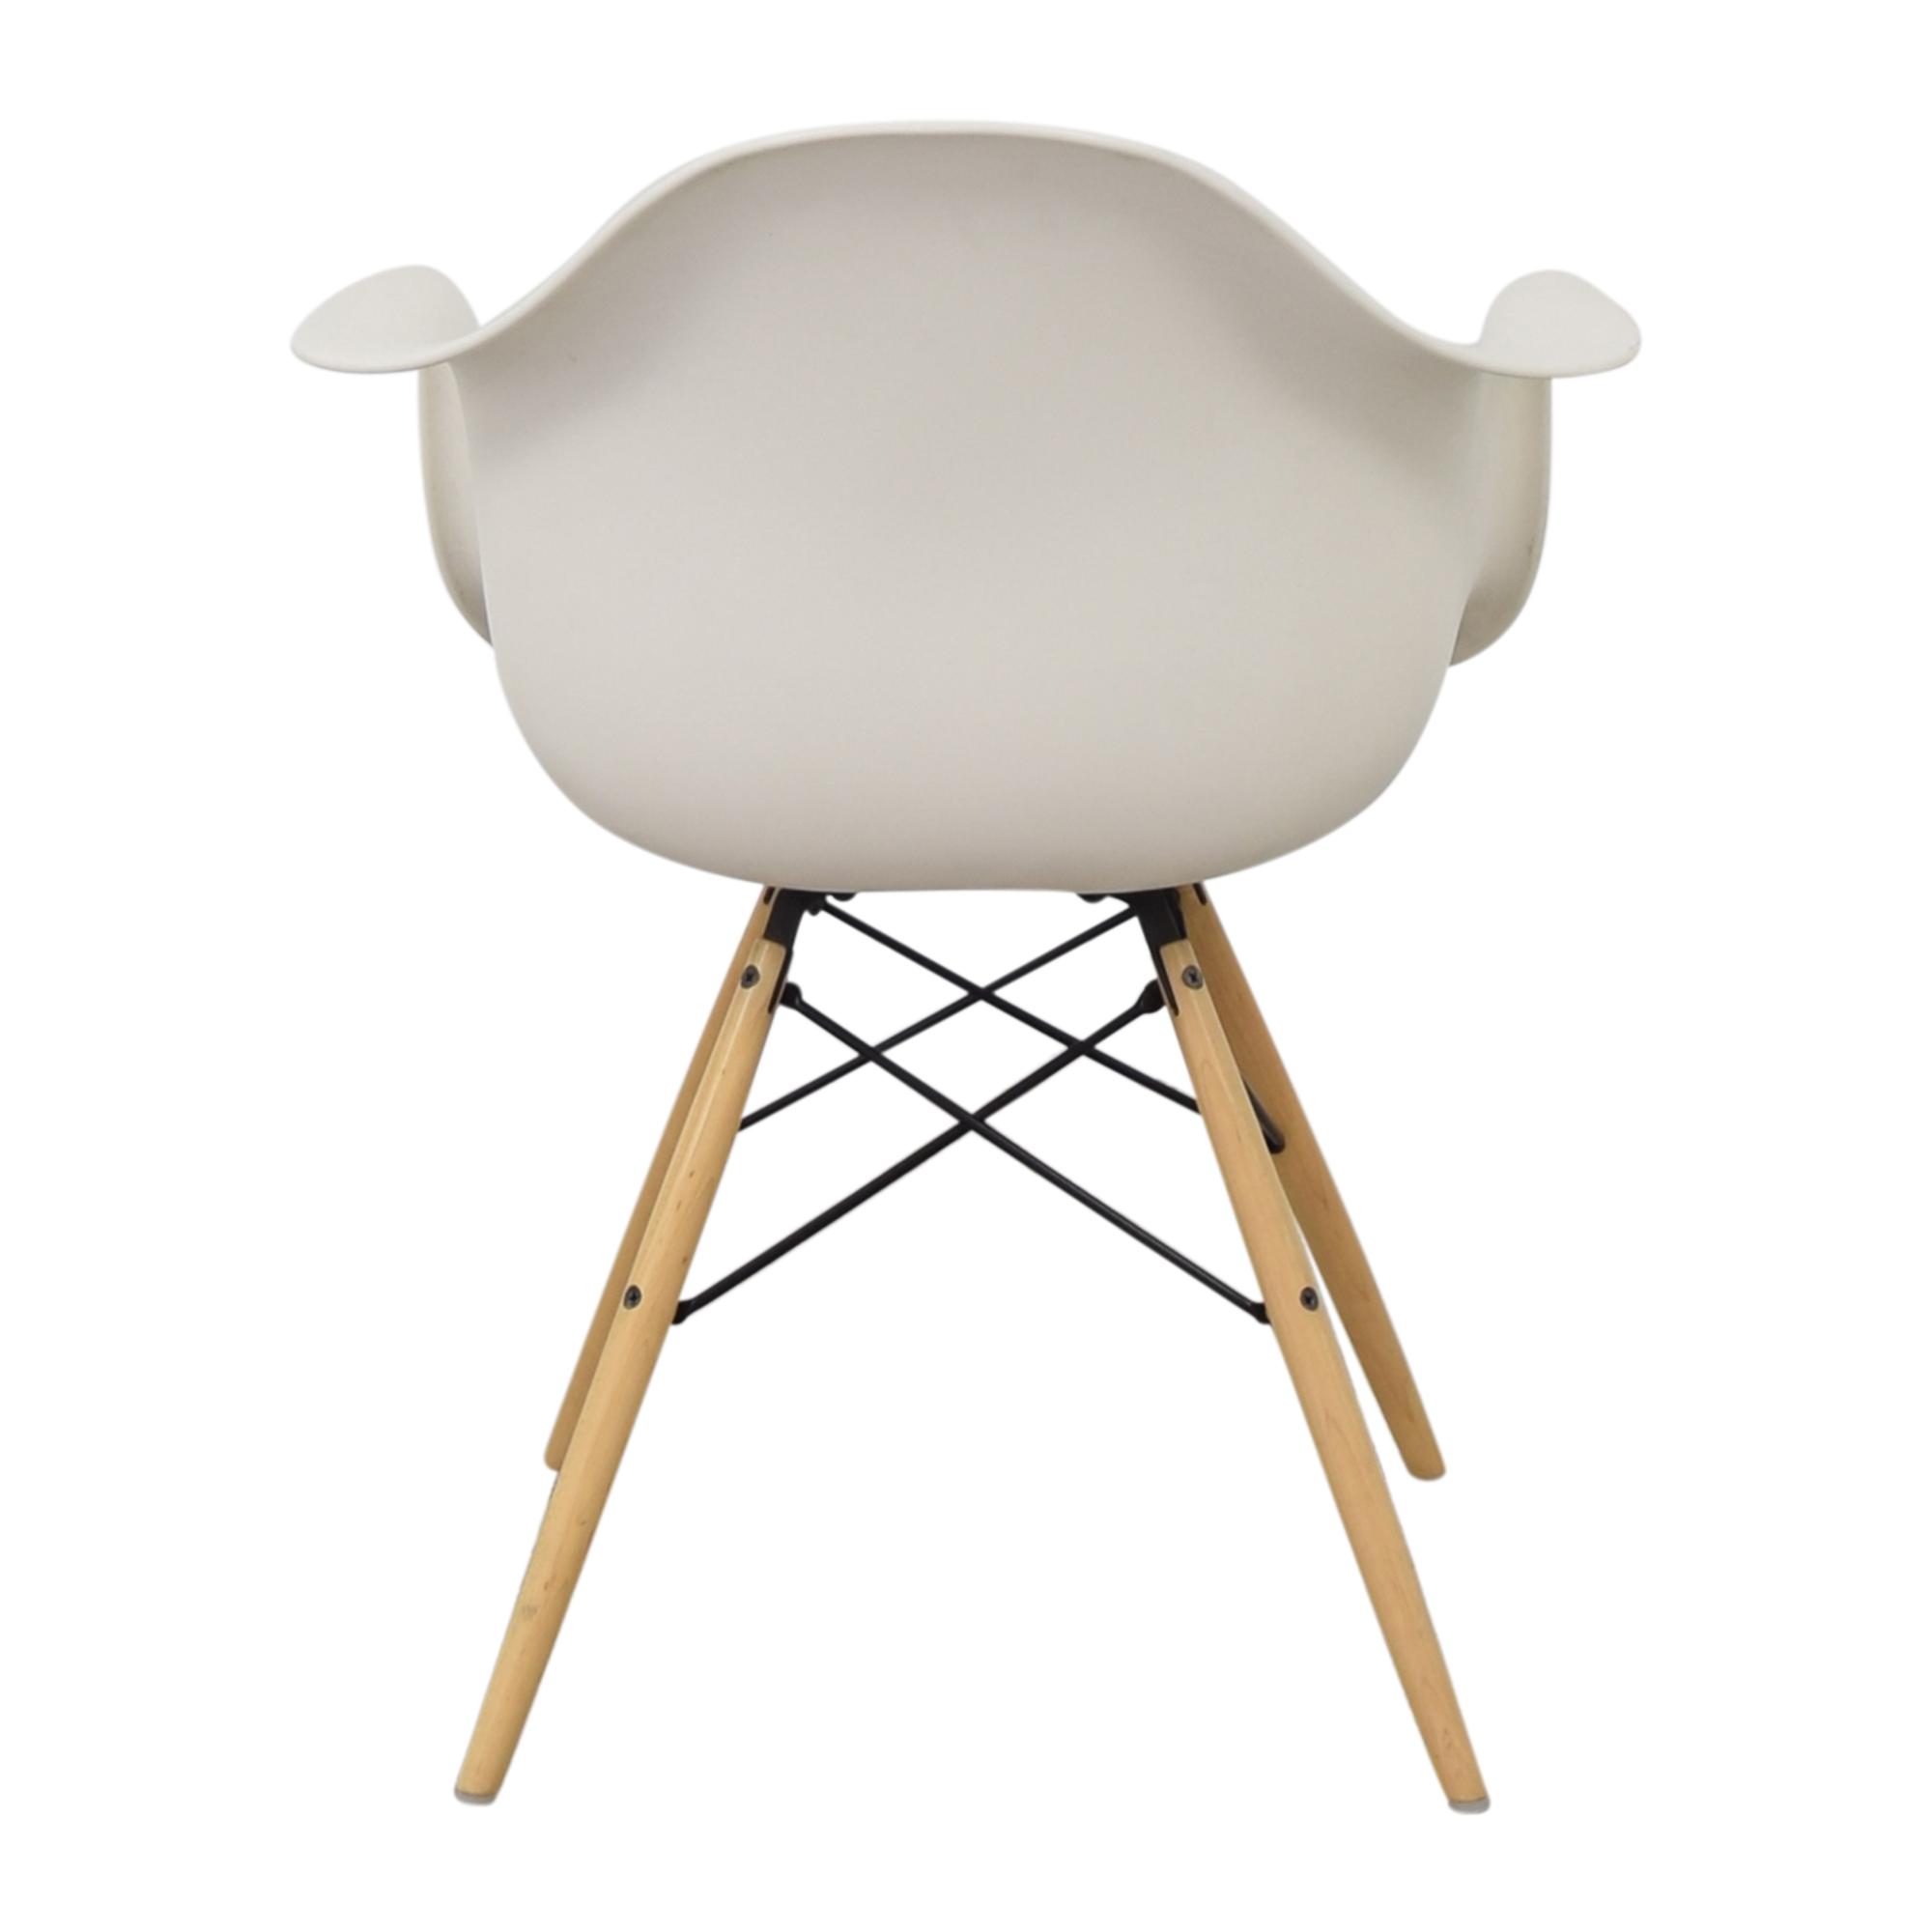 Herman Miller Herman Miller Eames Molded Arm Chair coupon